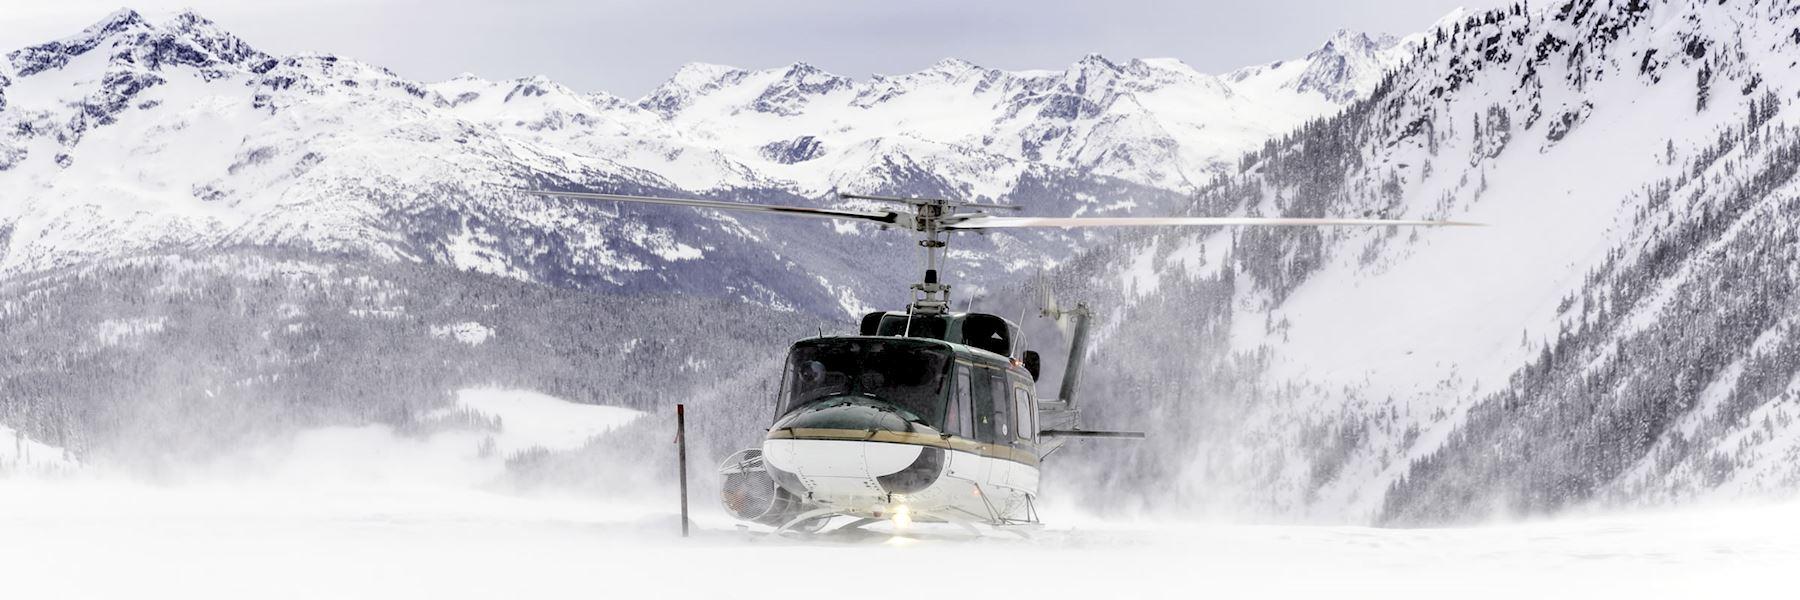 Mount Assiniboine and Gloria Glacier helicopter tour